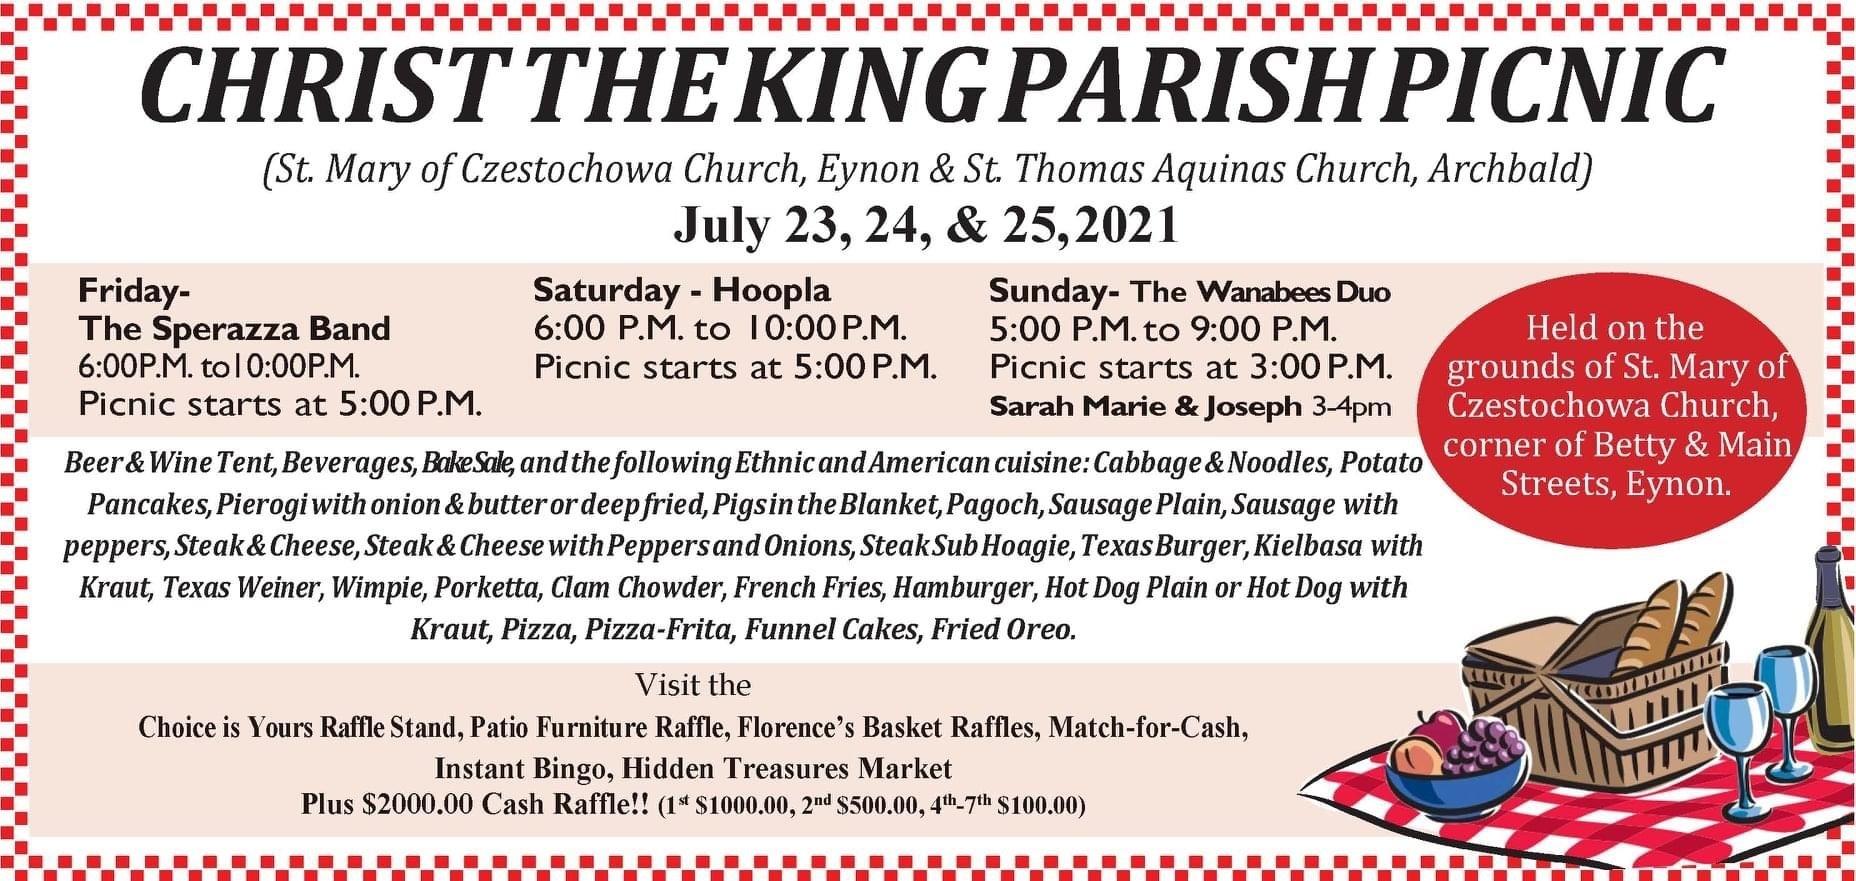 Christ the King Parish Picnic